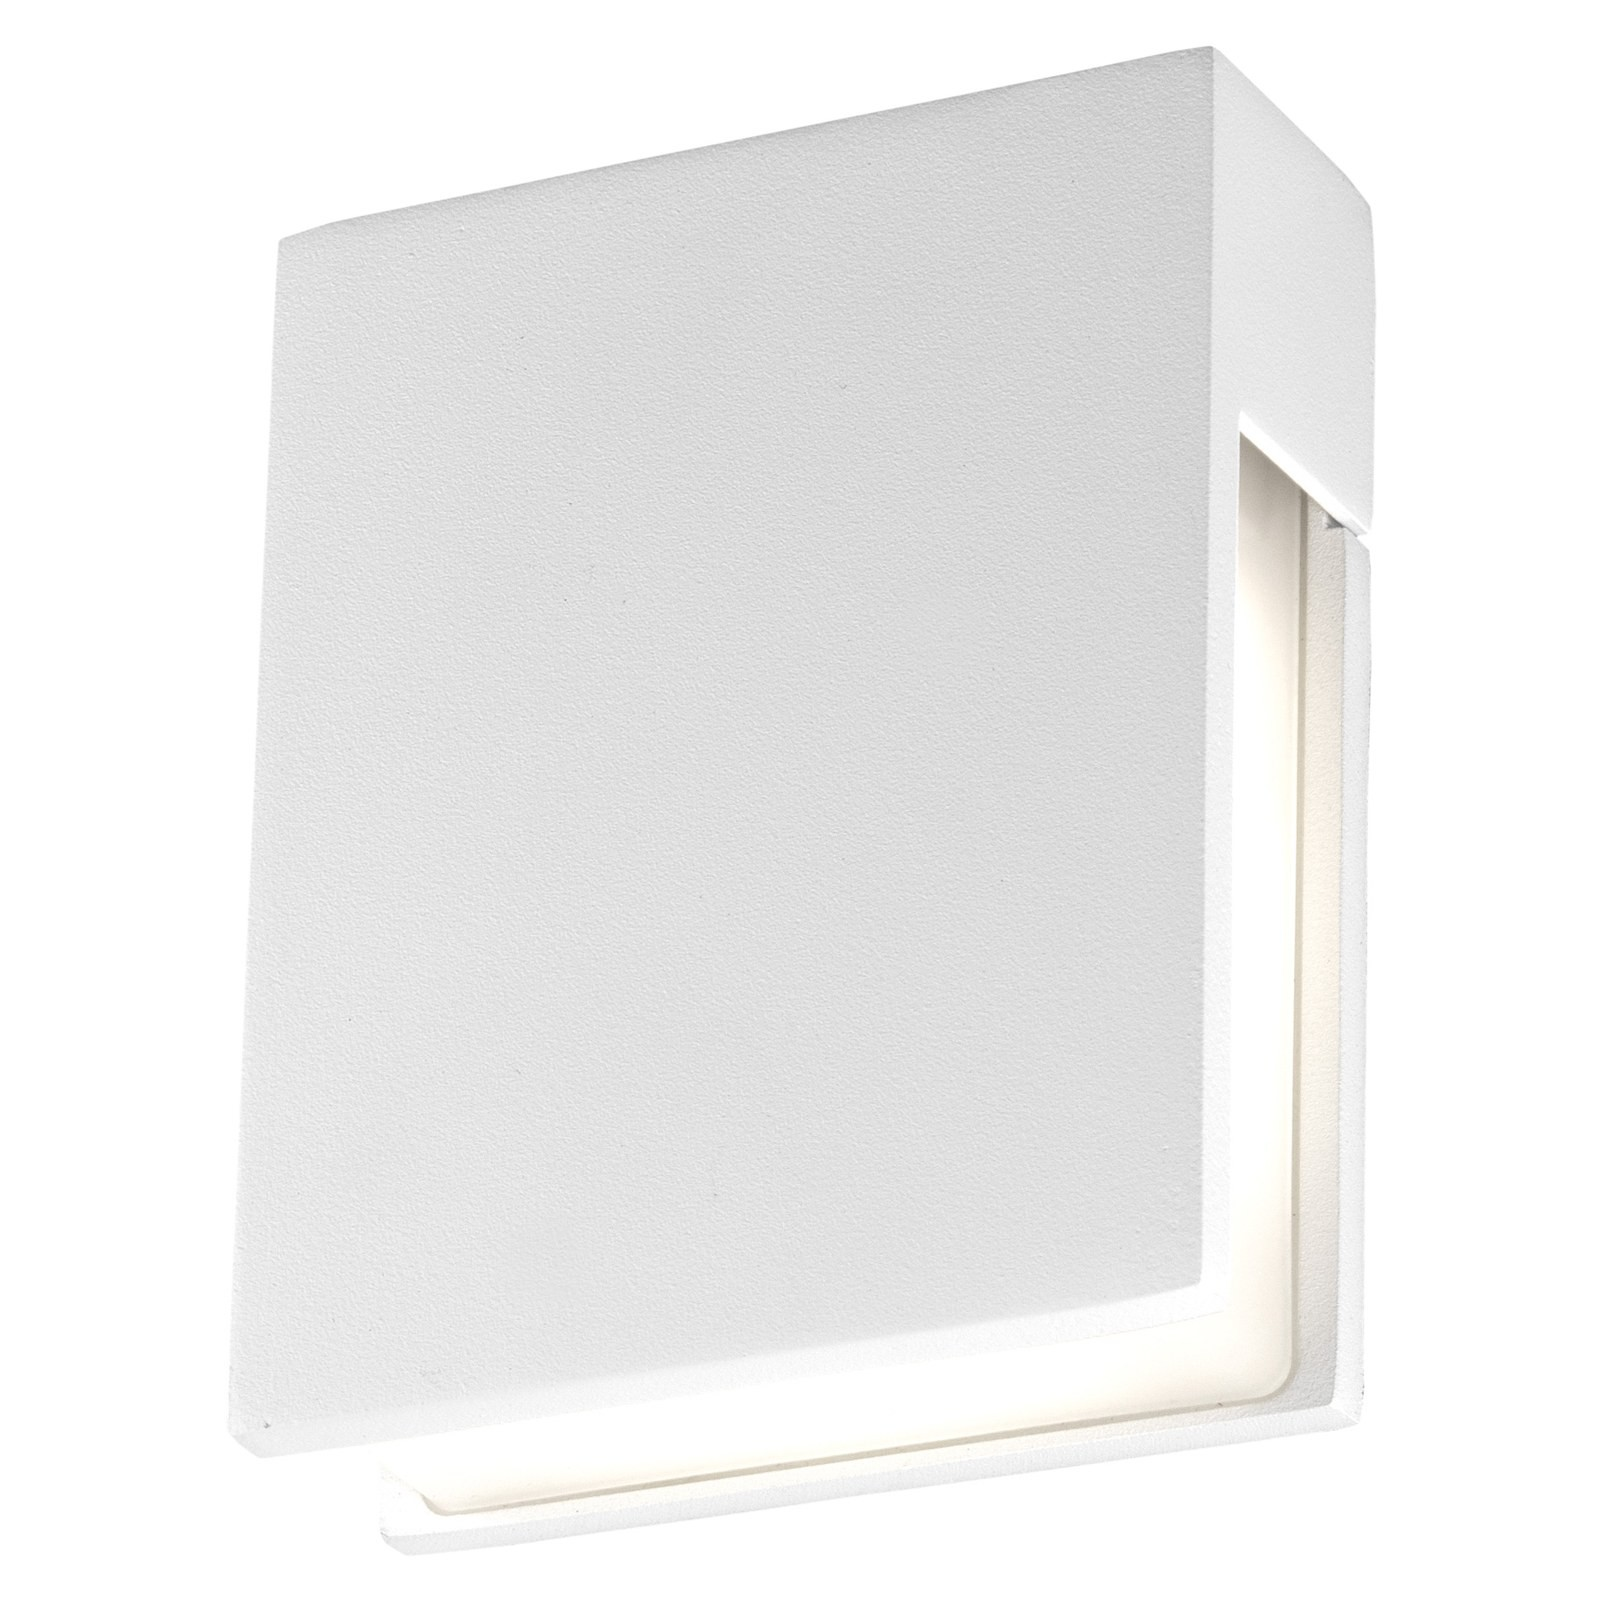 Lampada parete applique led uso esterno a led pan dankan - Applique led esterno ...